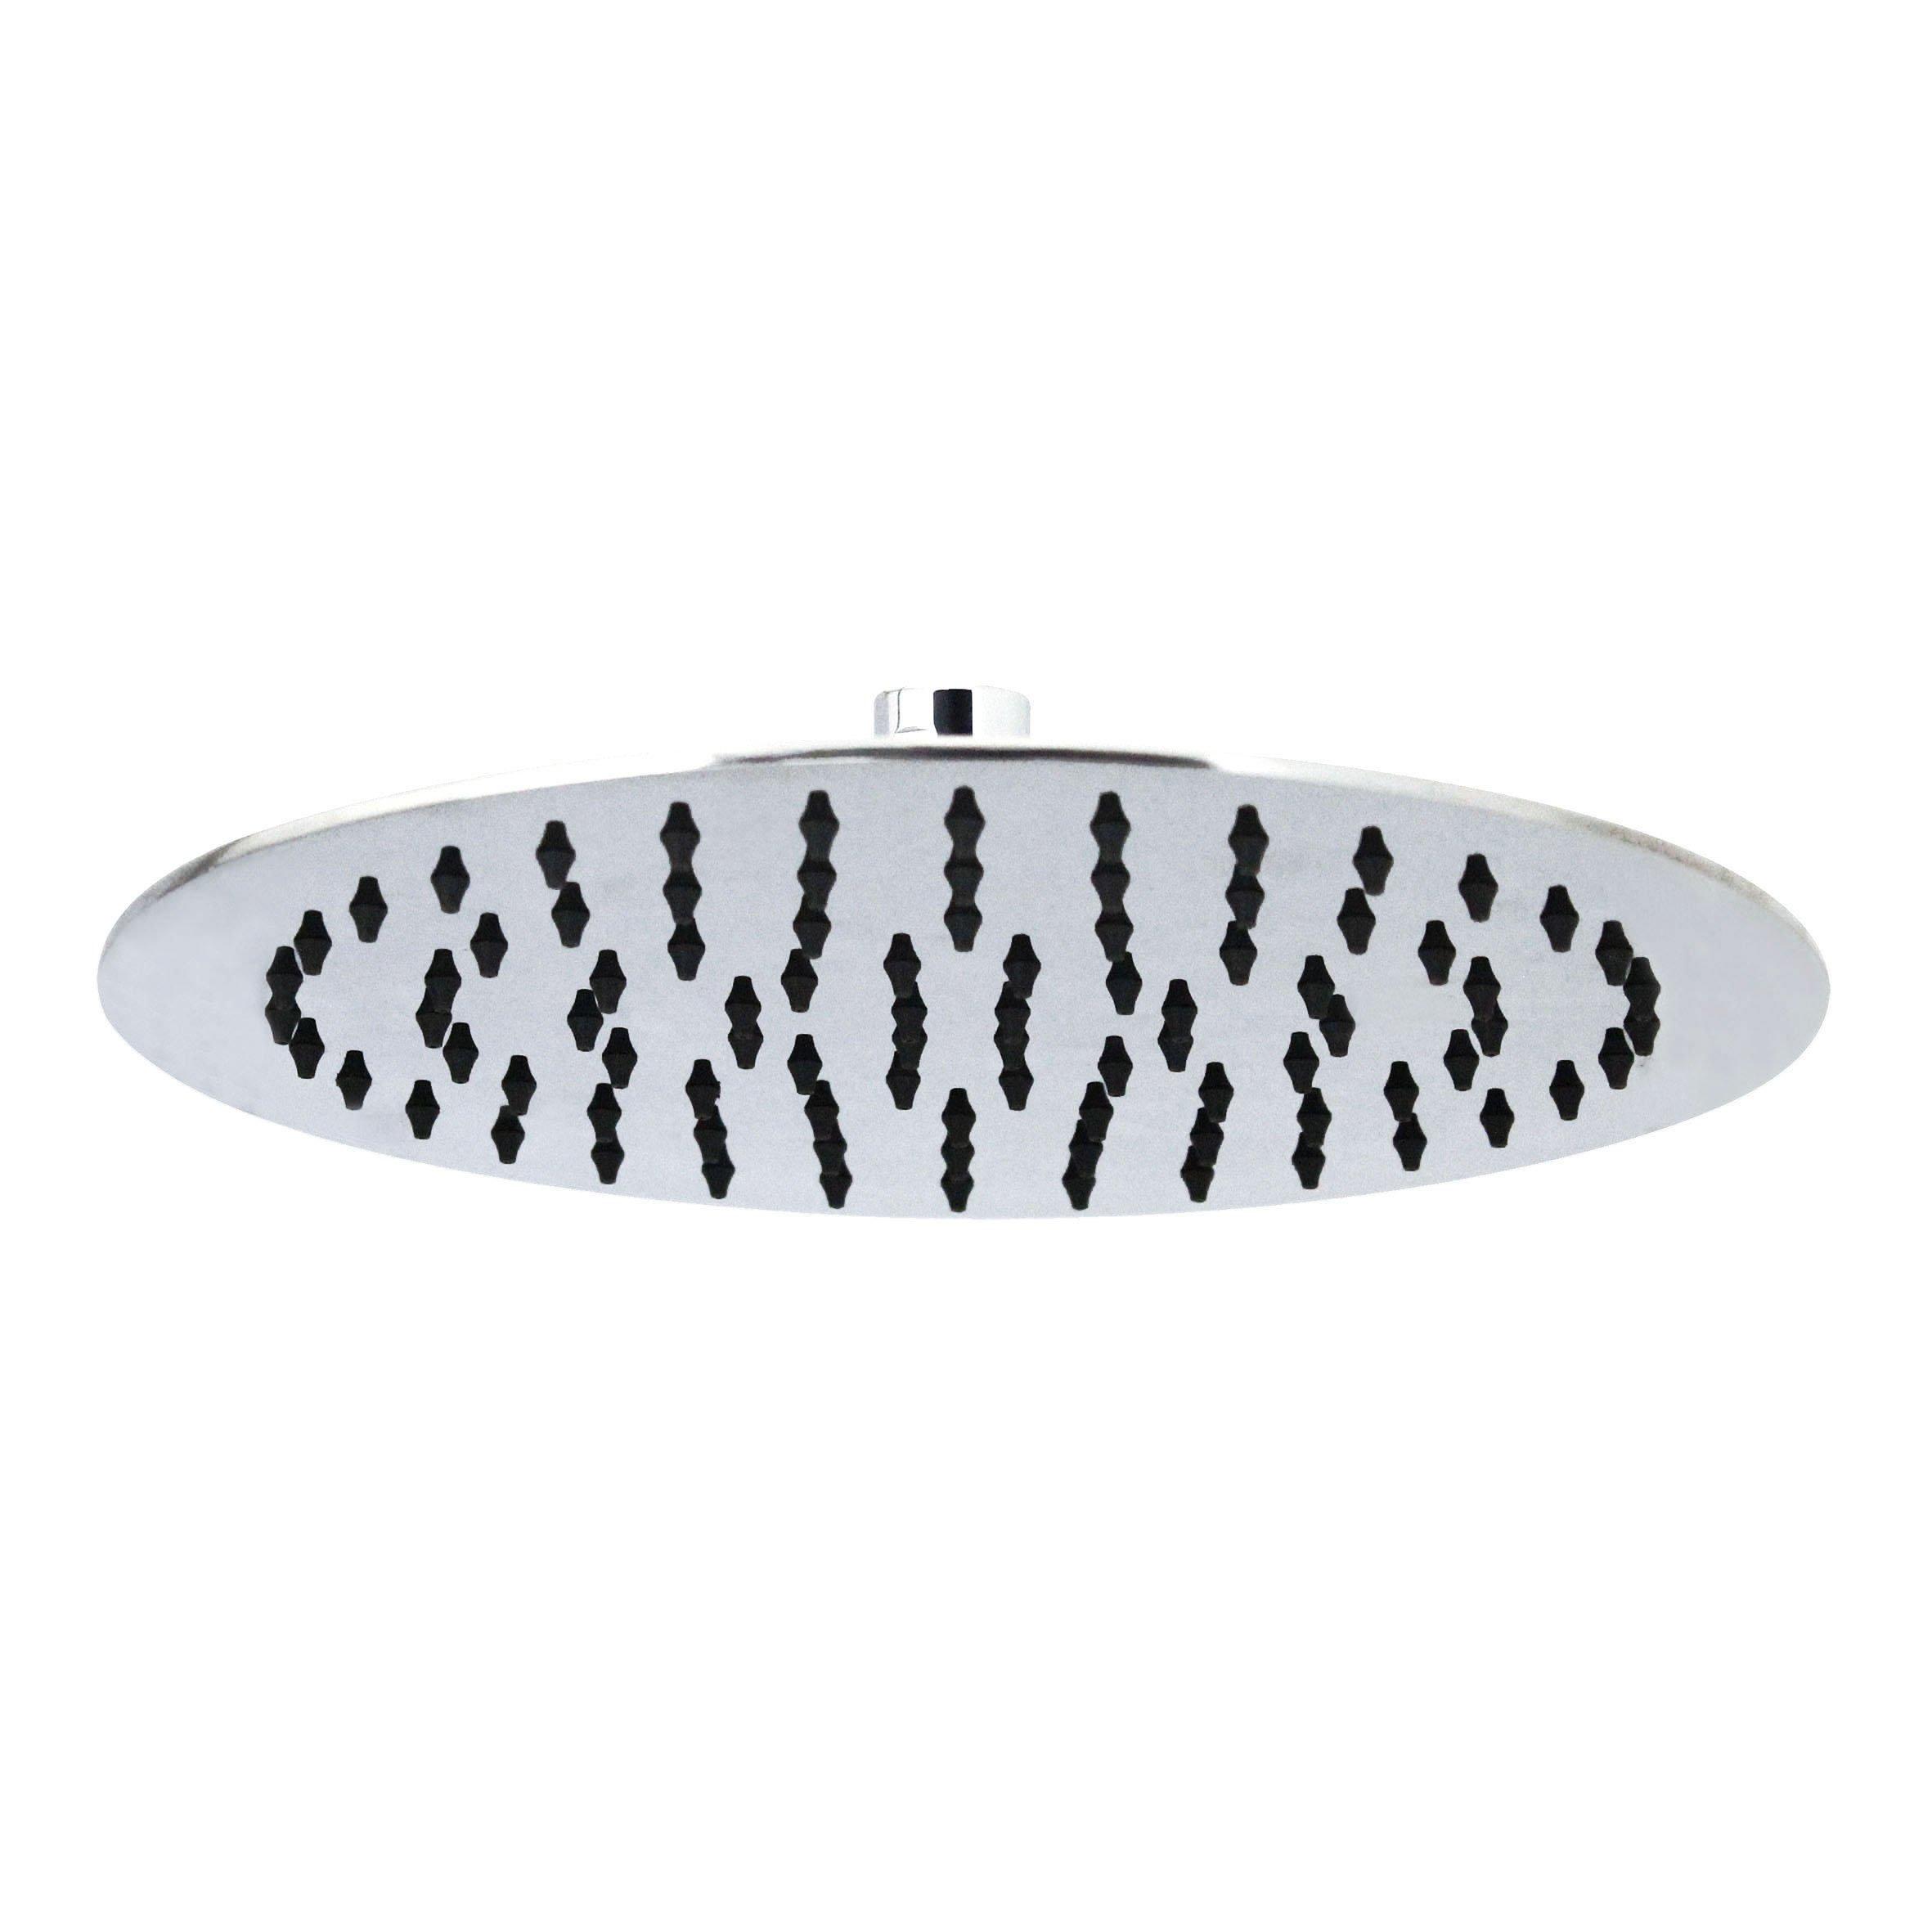 MODONA 10'' THIN Round Rain Shower Head - STAINLESS STEEL (SS304)